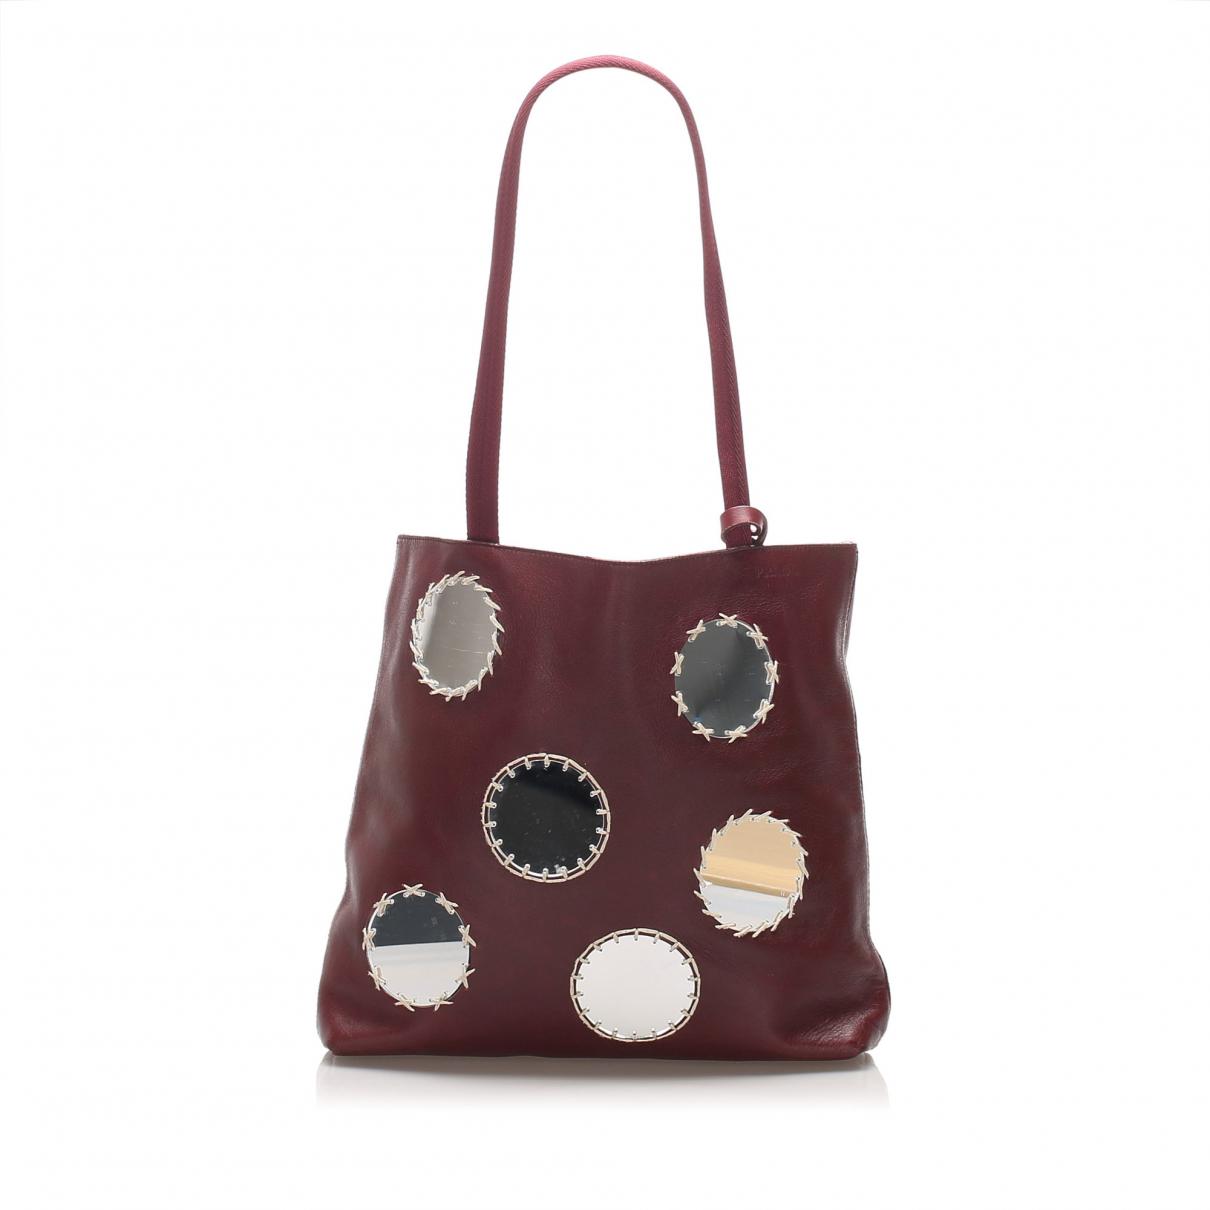 Prada \N Red Leather handbag for Women \N